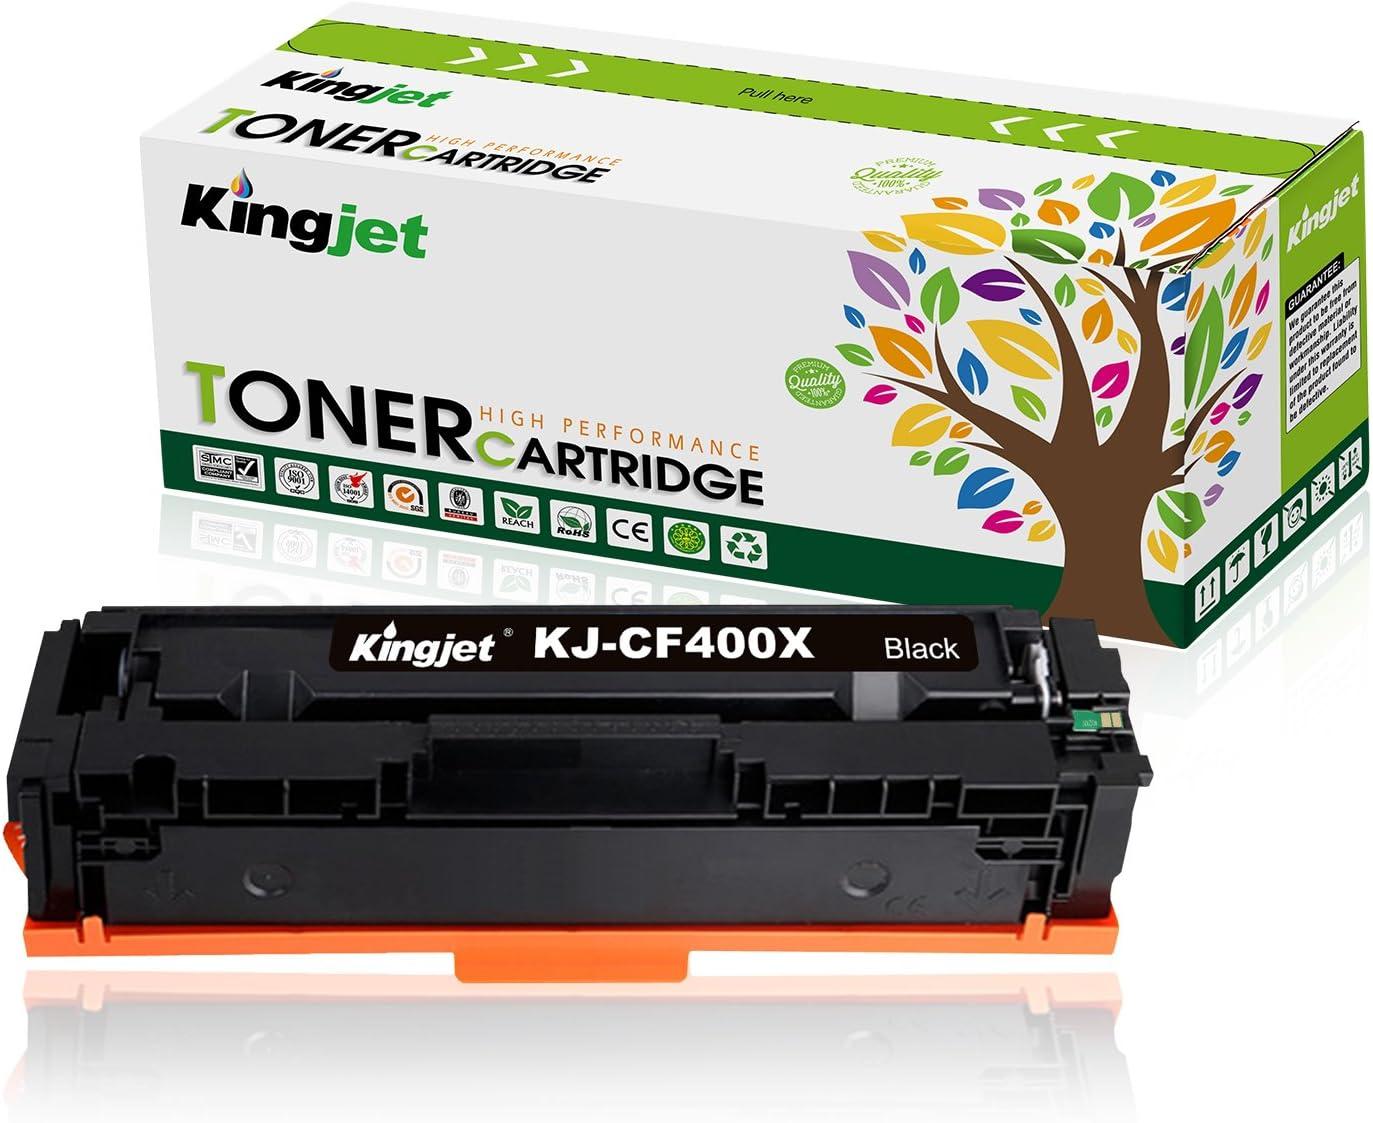 Kingjet Compatible Toner Cartridge Replacement for HP 201X CF400X, Work with Color Laserjet Pro MFP M277dw M252dw MFP M277n M252n Printer 1 Pack (Black)